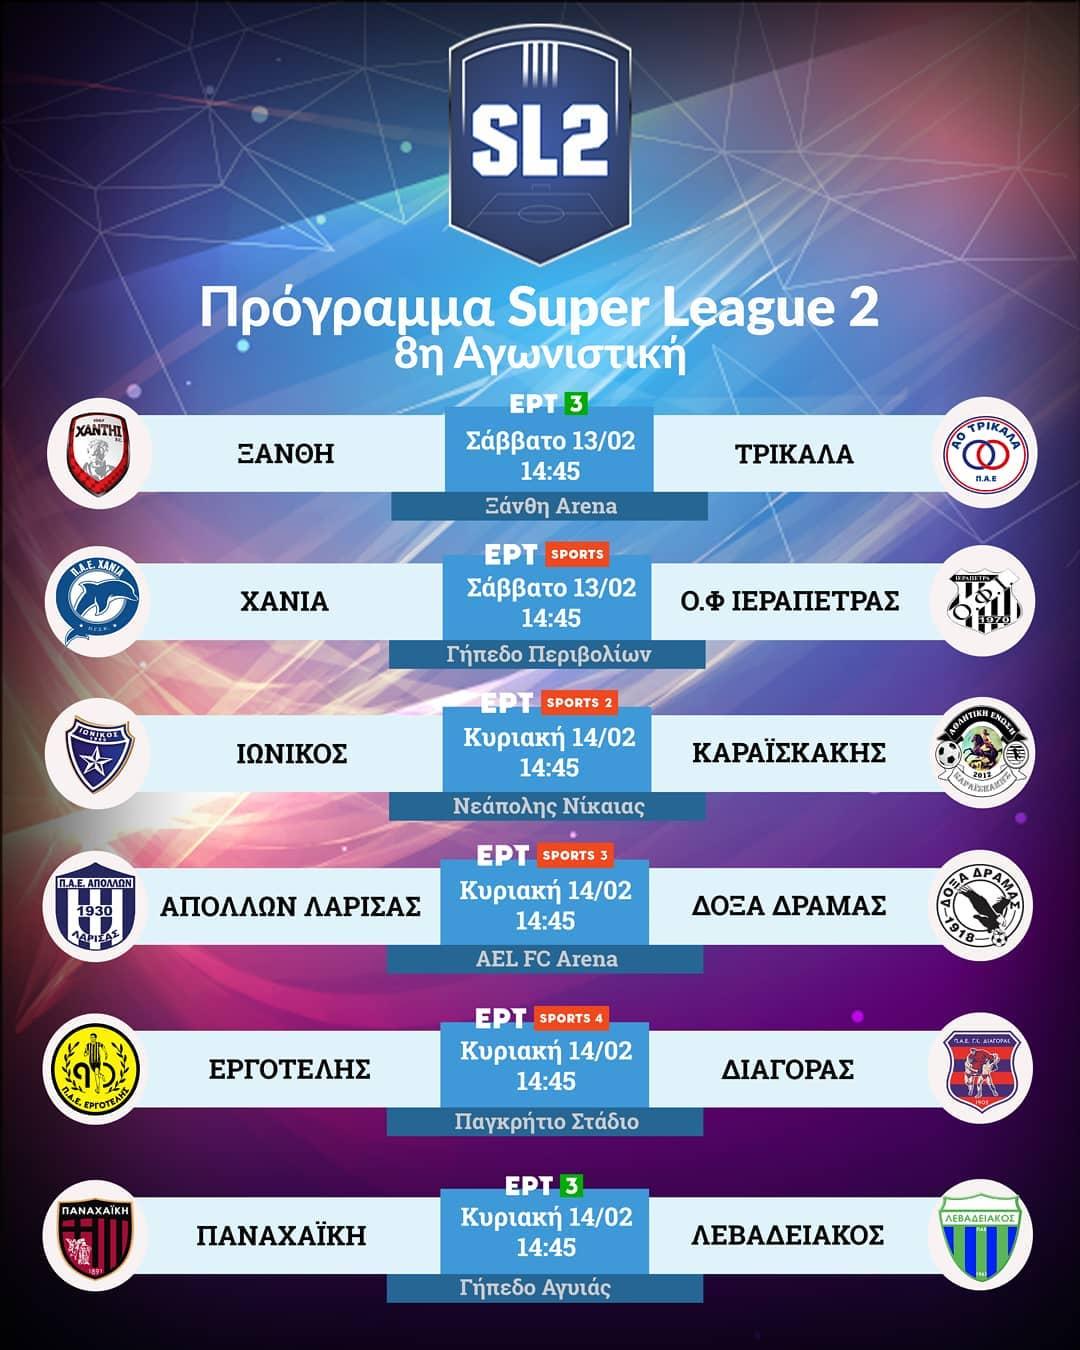 Super League 2 – 9η αγωνιστική: Το νέο πρόγραμμα μετά την αλλαγή